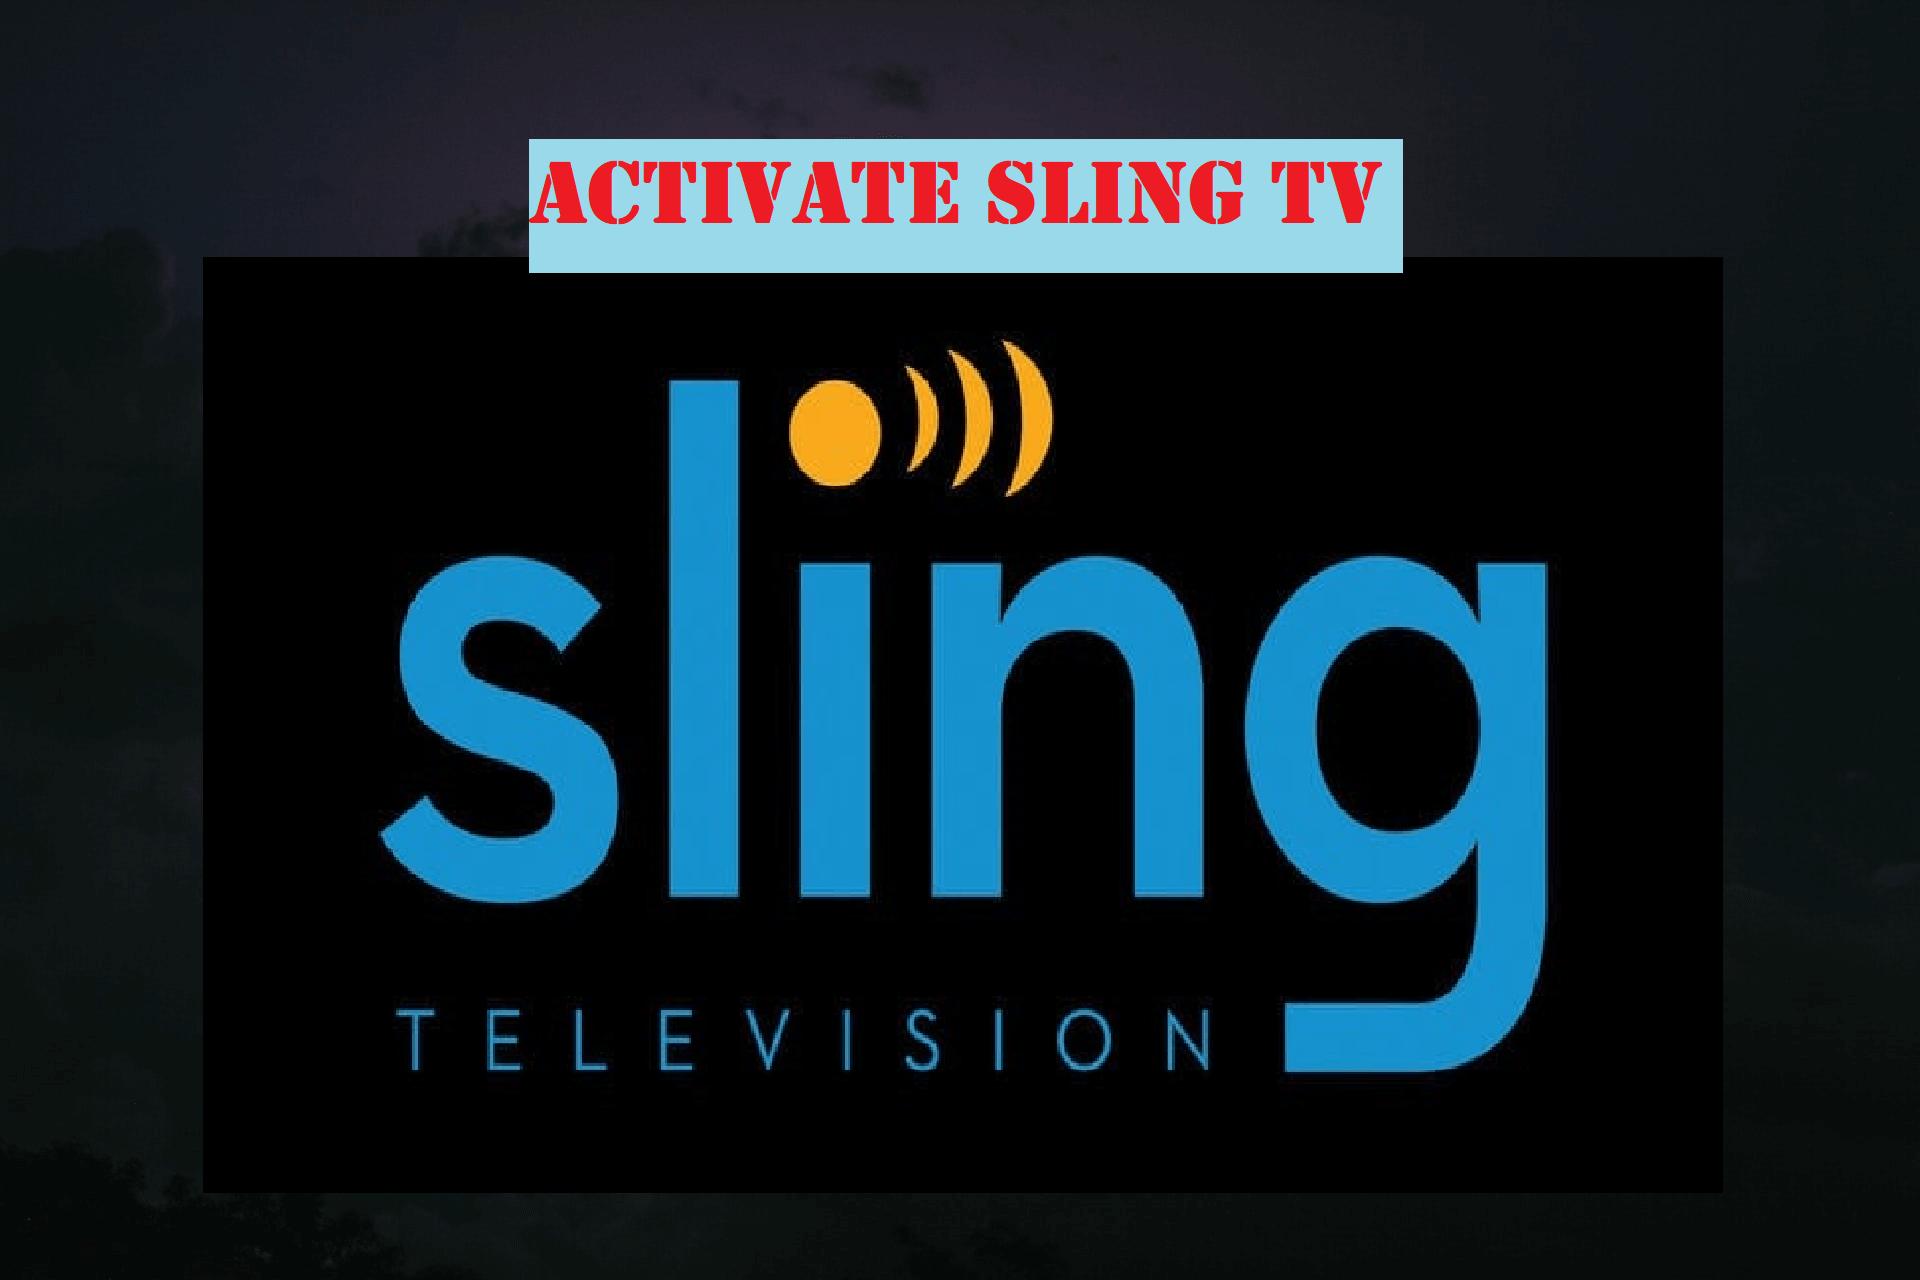 Sling com activate 16428cc90